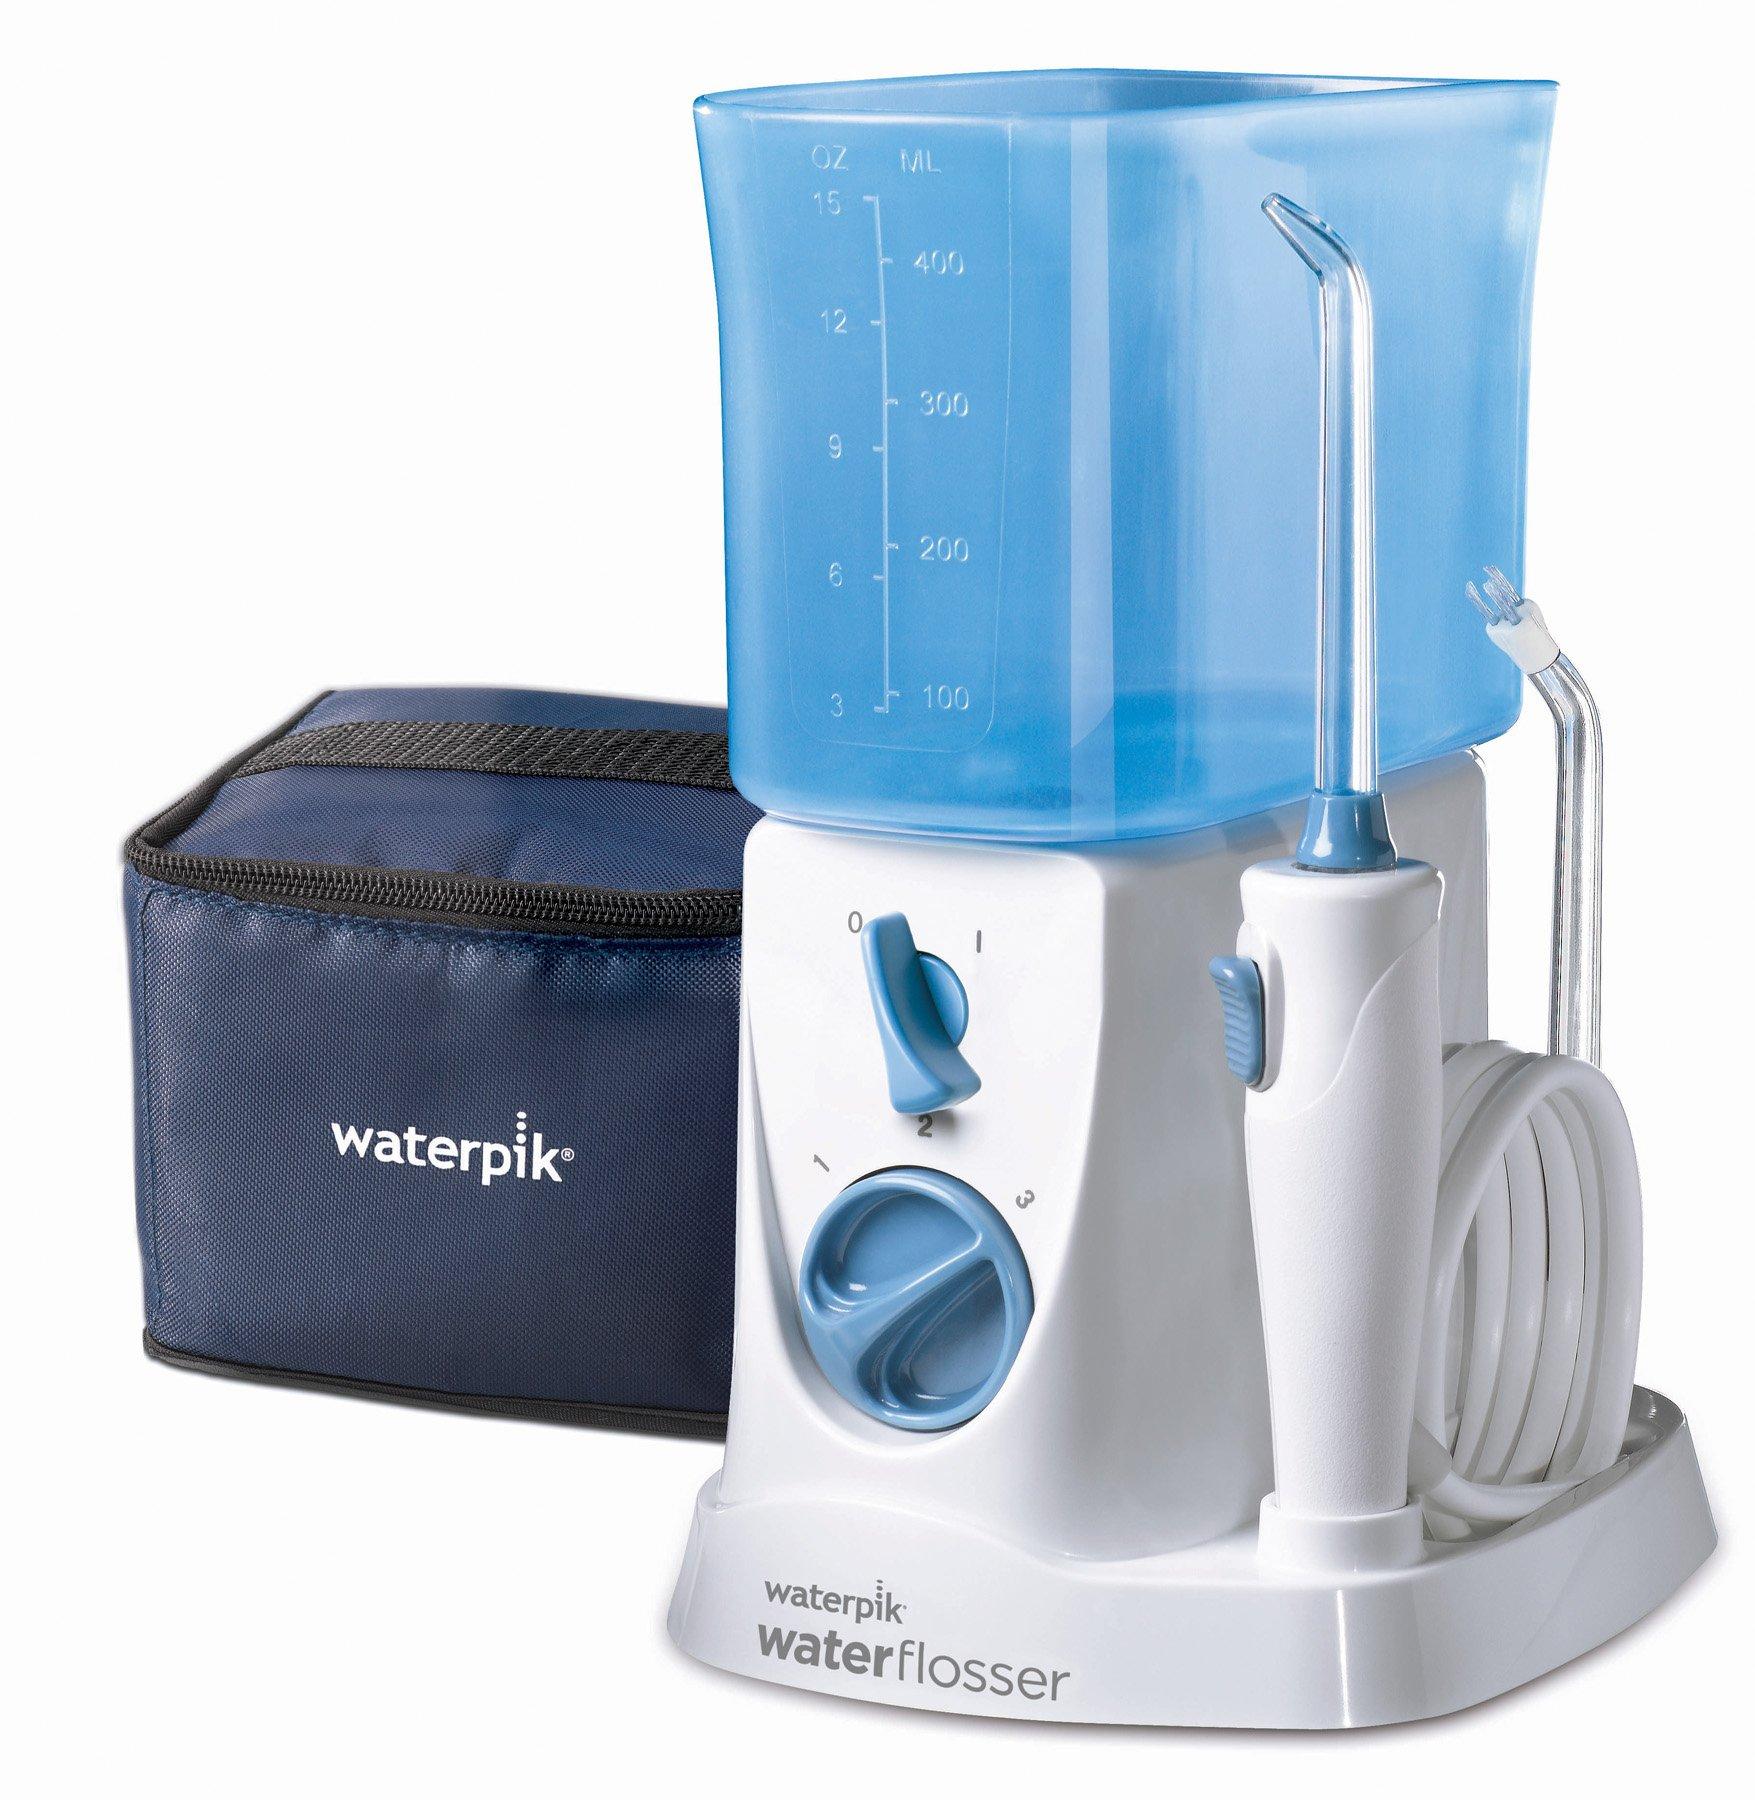 Waterpik - 9953368 - Hydropulseur - WP 300 Traveler product image